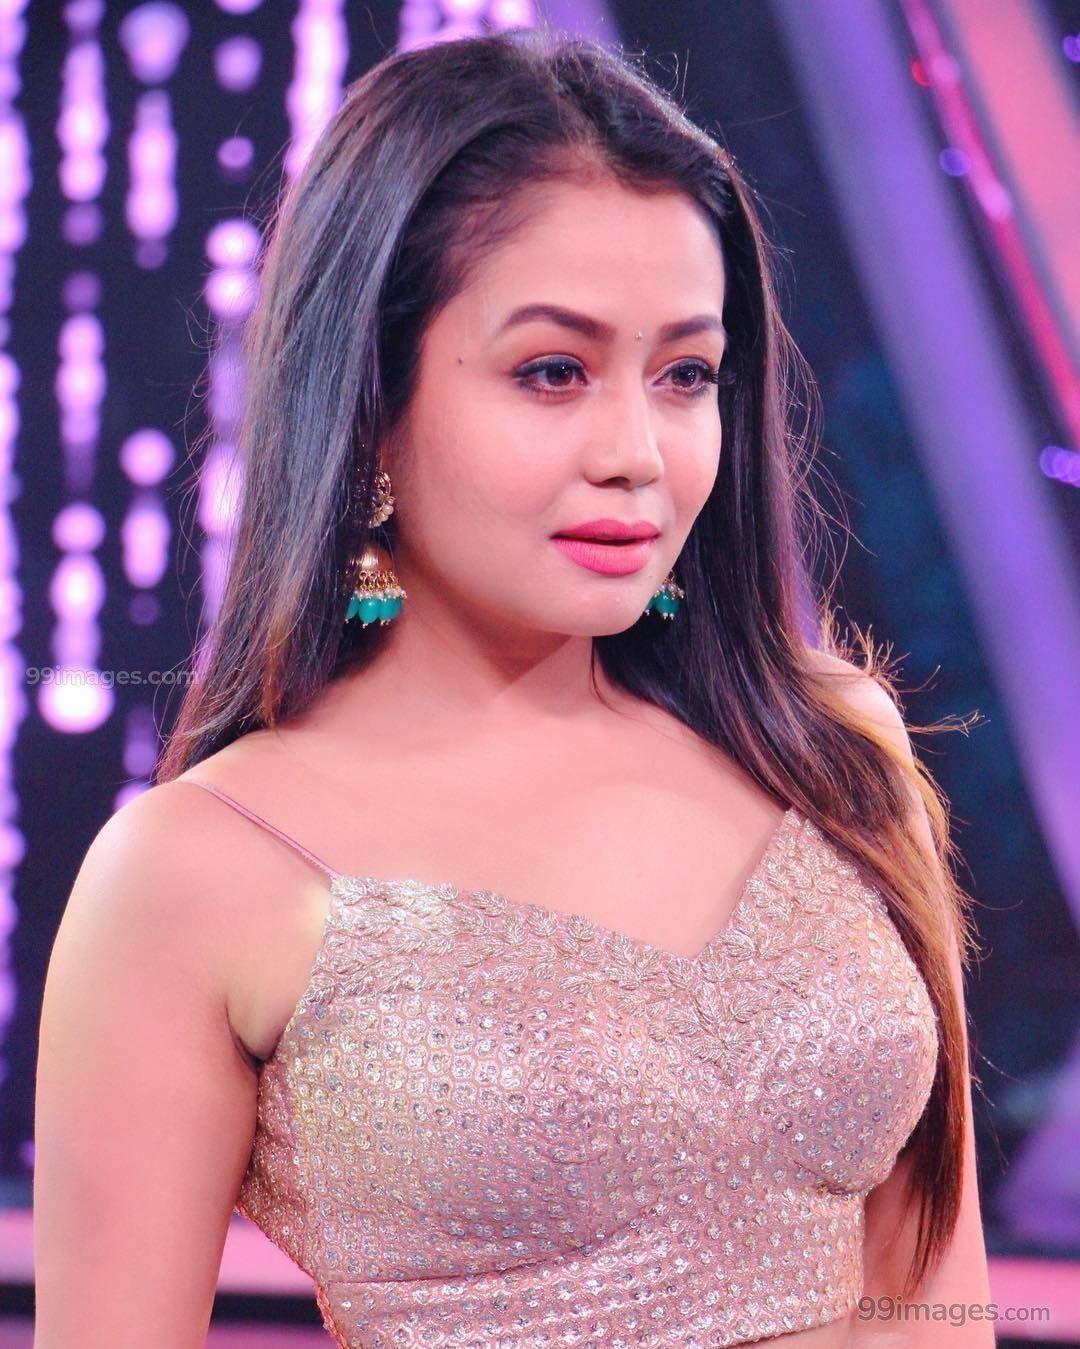 Neha Kakkar Beautiful Photos Mobile Wallpapers Hd Android Iphone 1080p 37815 Nehakakka Bollywood Actress Hot Photos Bollywood Actress Hot Desi Beauty